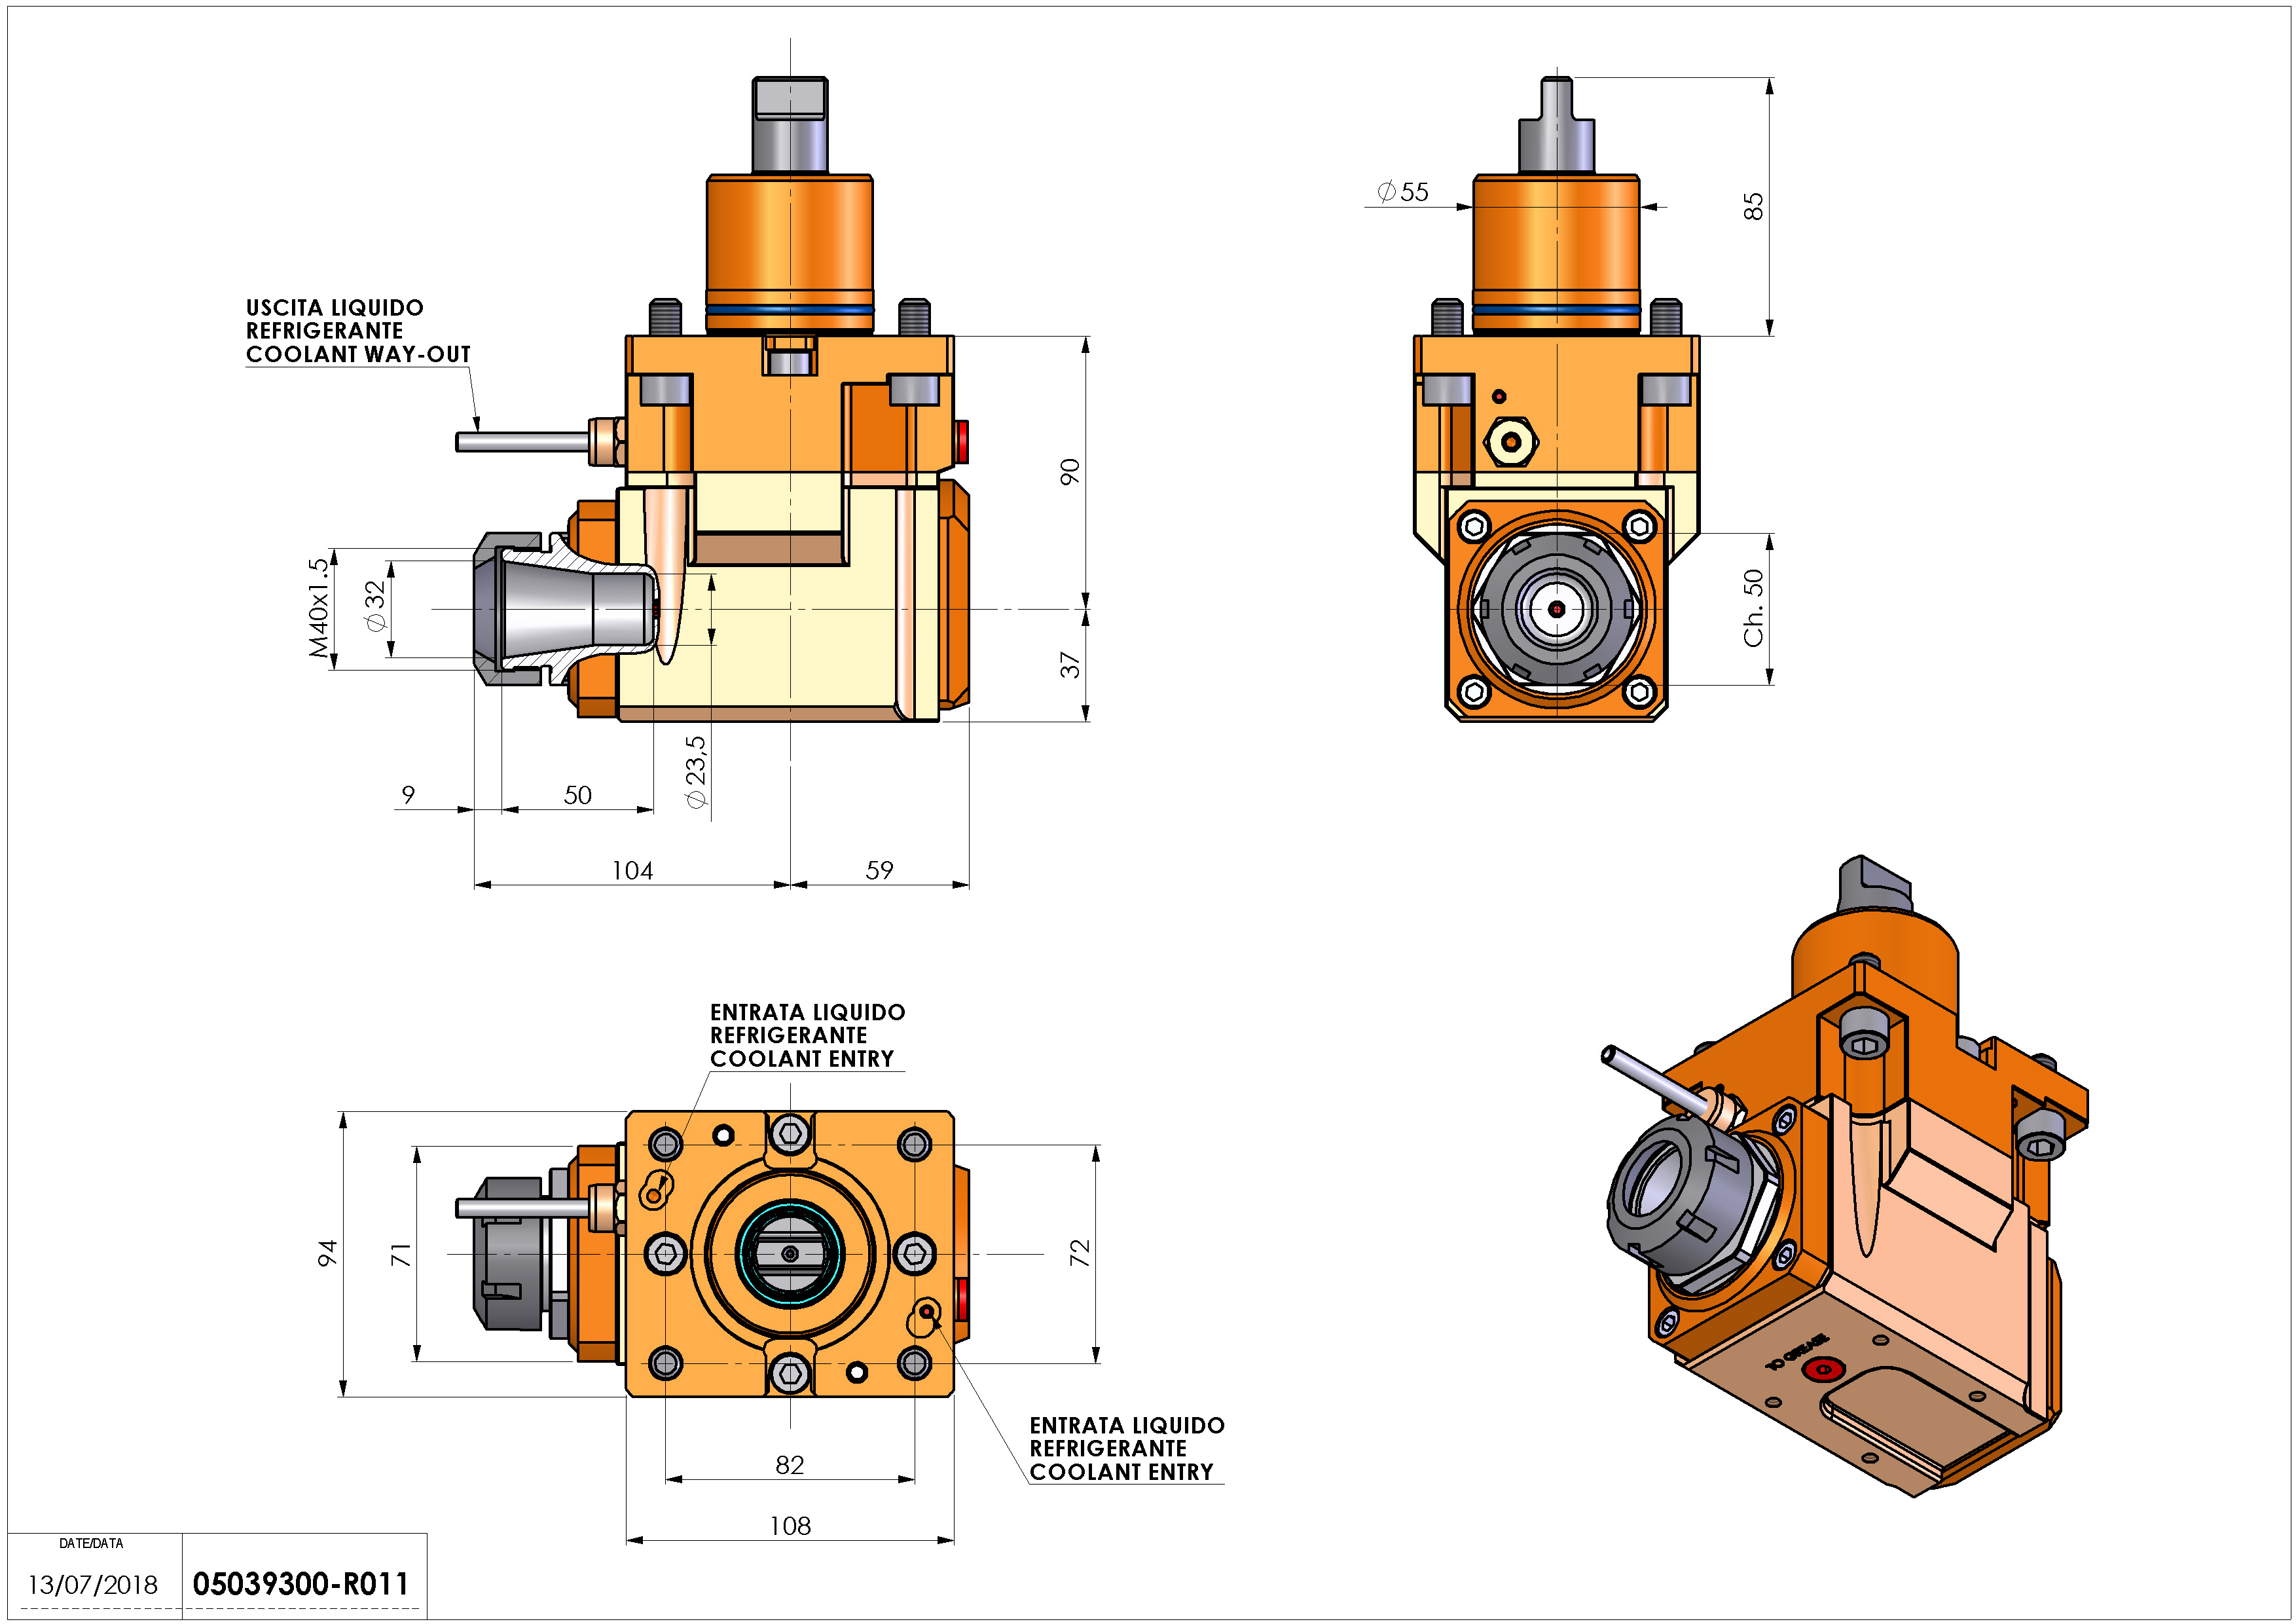 Technical image - LT-A D55 ER32 LR H90.